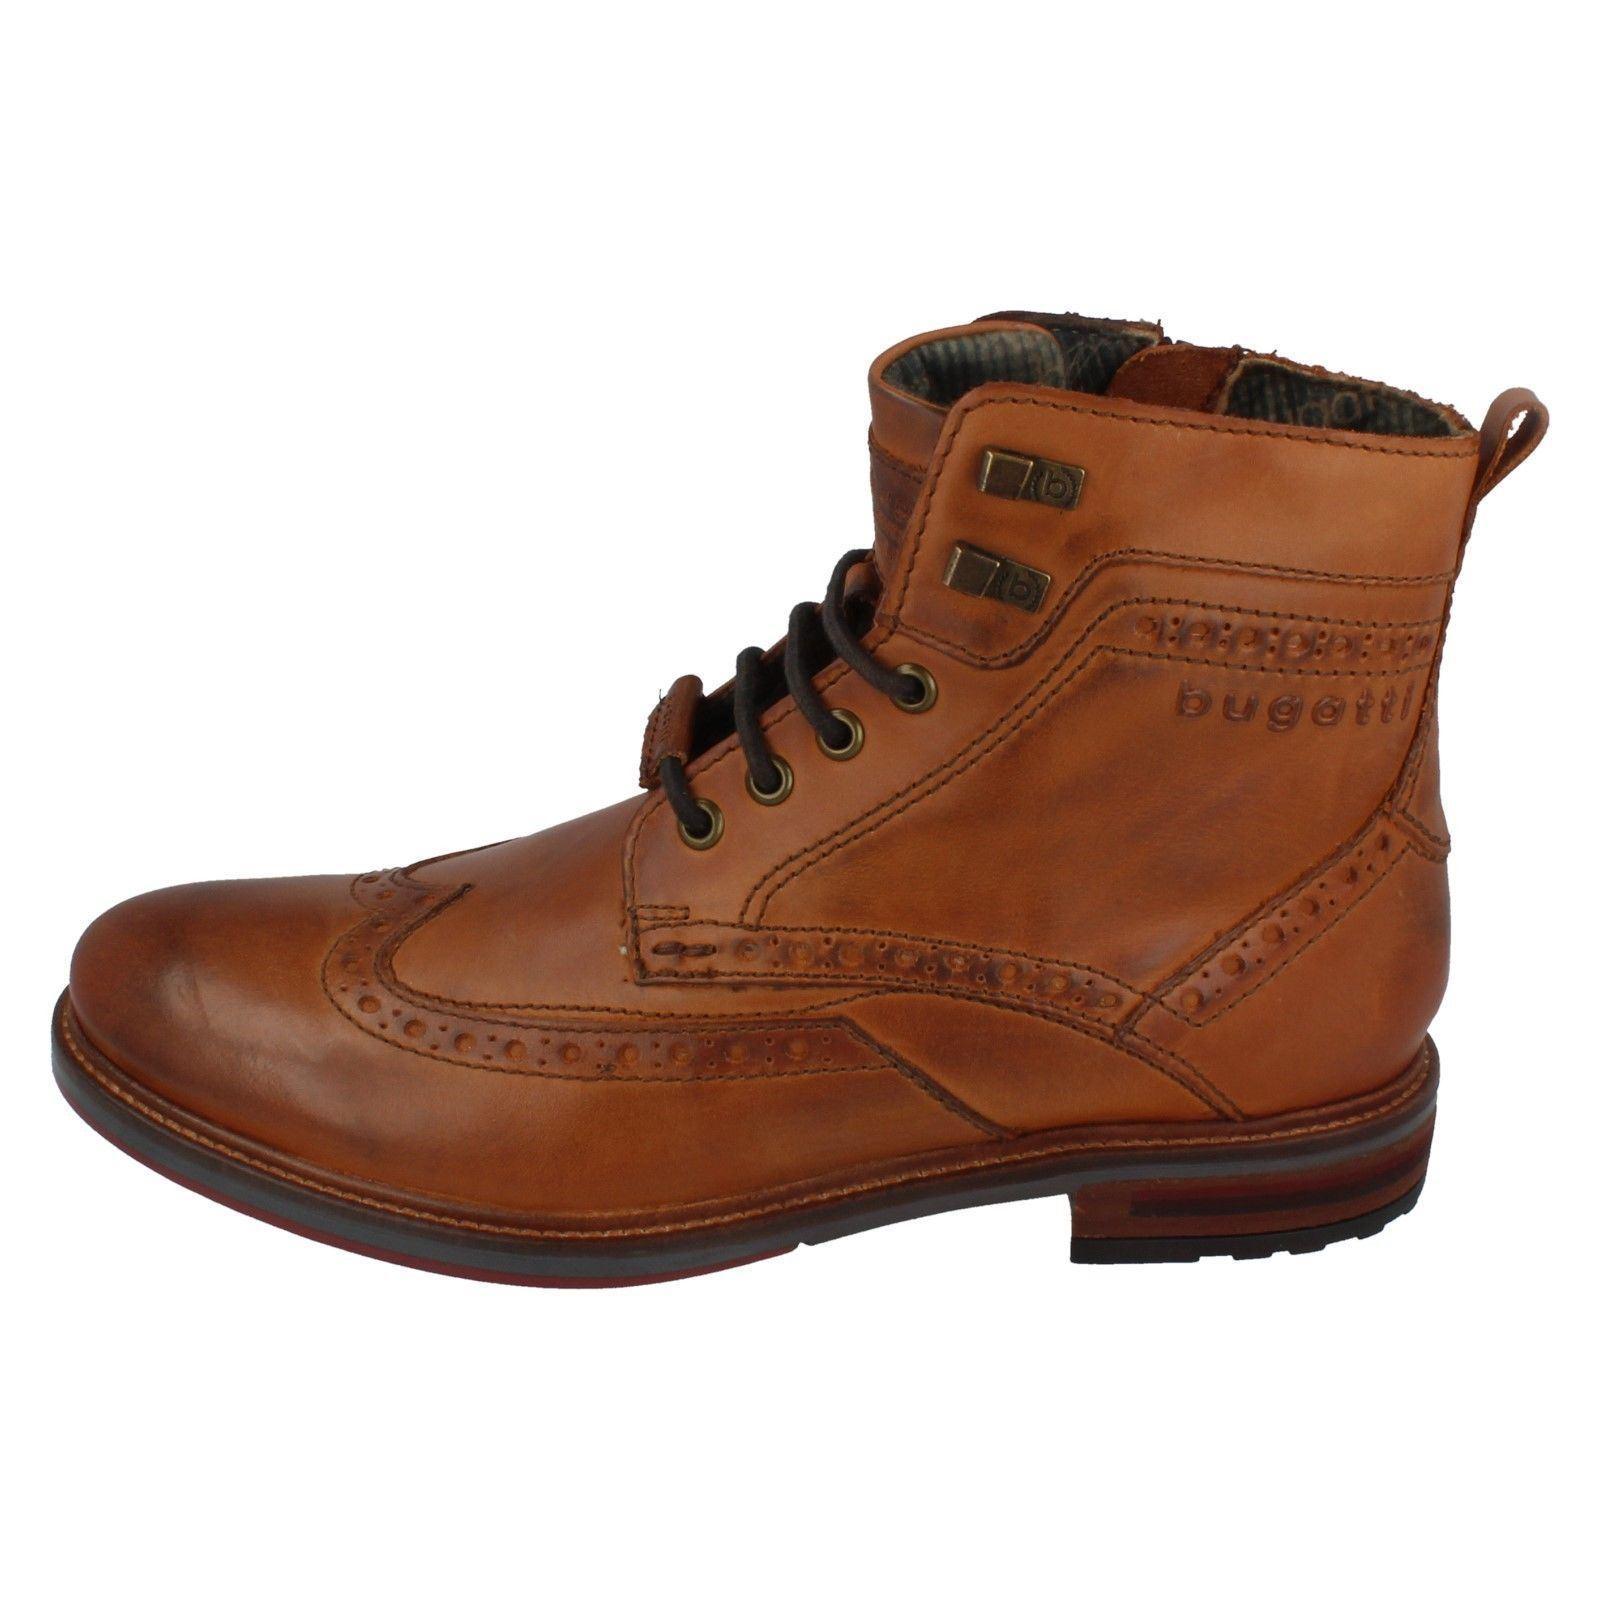 Mens Bugatti Bugatti Bugatti Leather Ankle Boots - The Style 311-37737-1100 ~ N 506b11